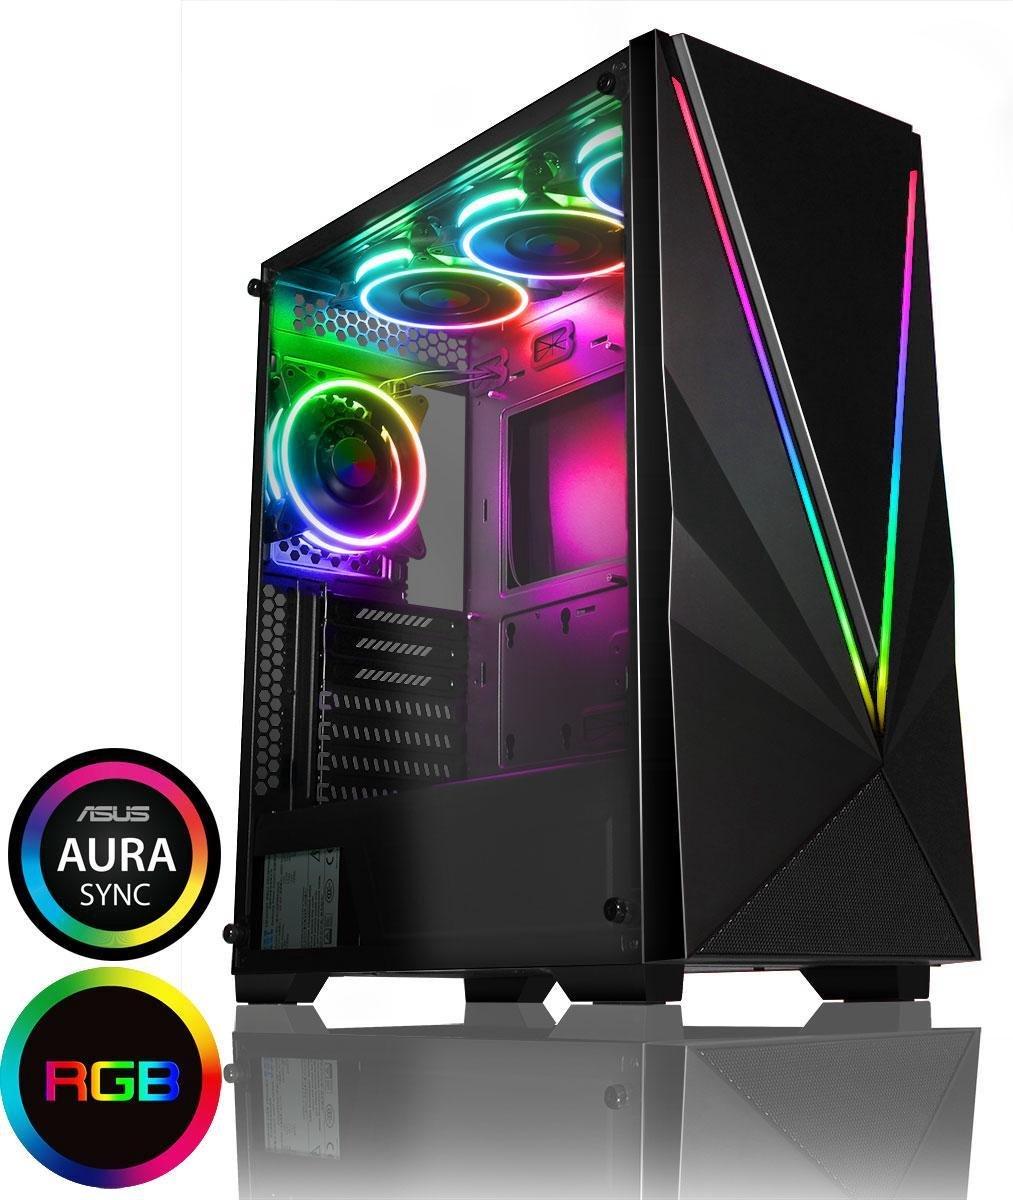 High-End Game PC Victory aRGB – RTX 3070 !!, Ryzen 3600XT 4,5 Ghz, 16GB DDR4, 500GB NVME SSD + 1TB HDD met RGB verlichting en WIFI. Alle nieuwe games op hoge settings!